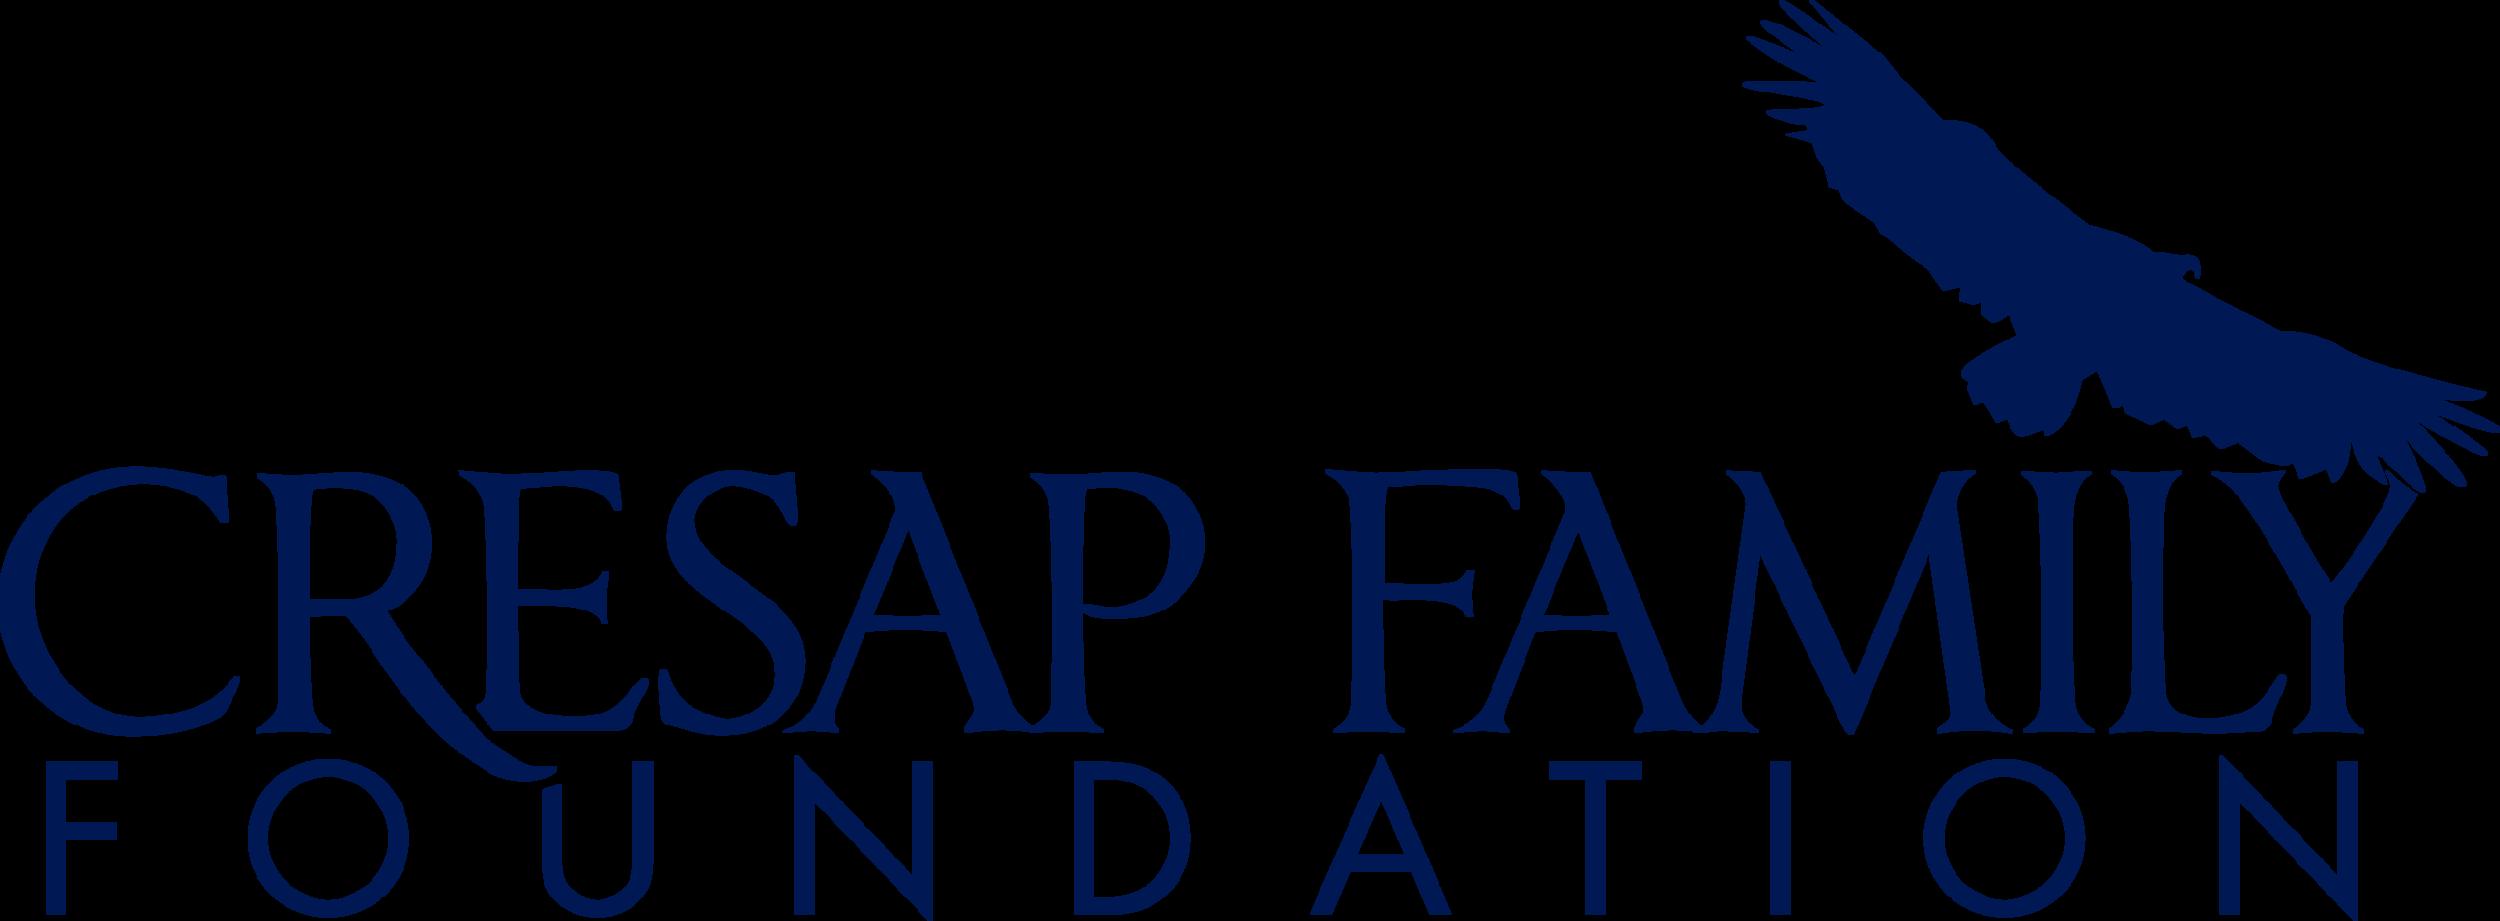 Cresap Family Foundation